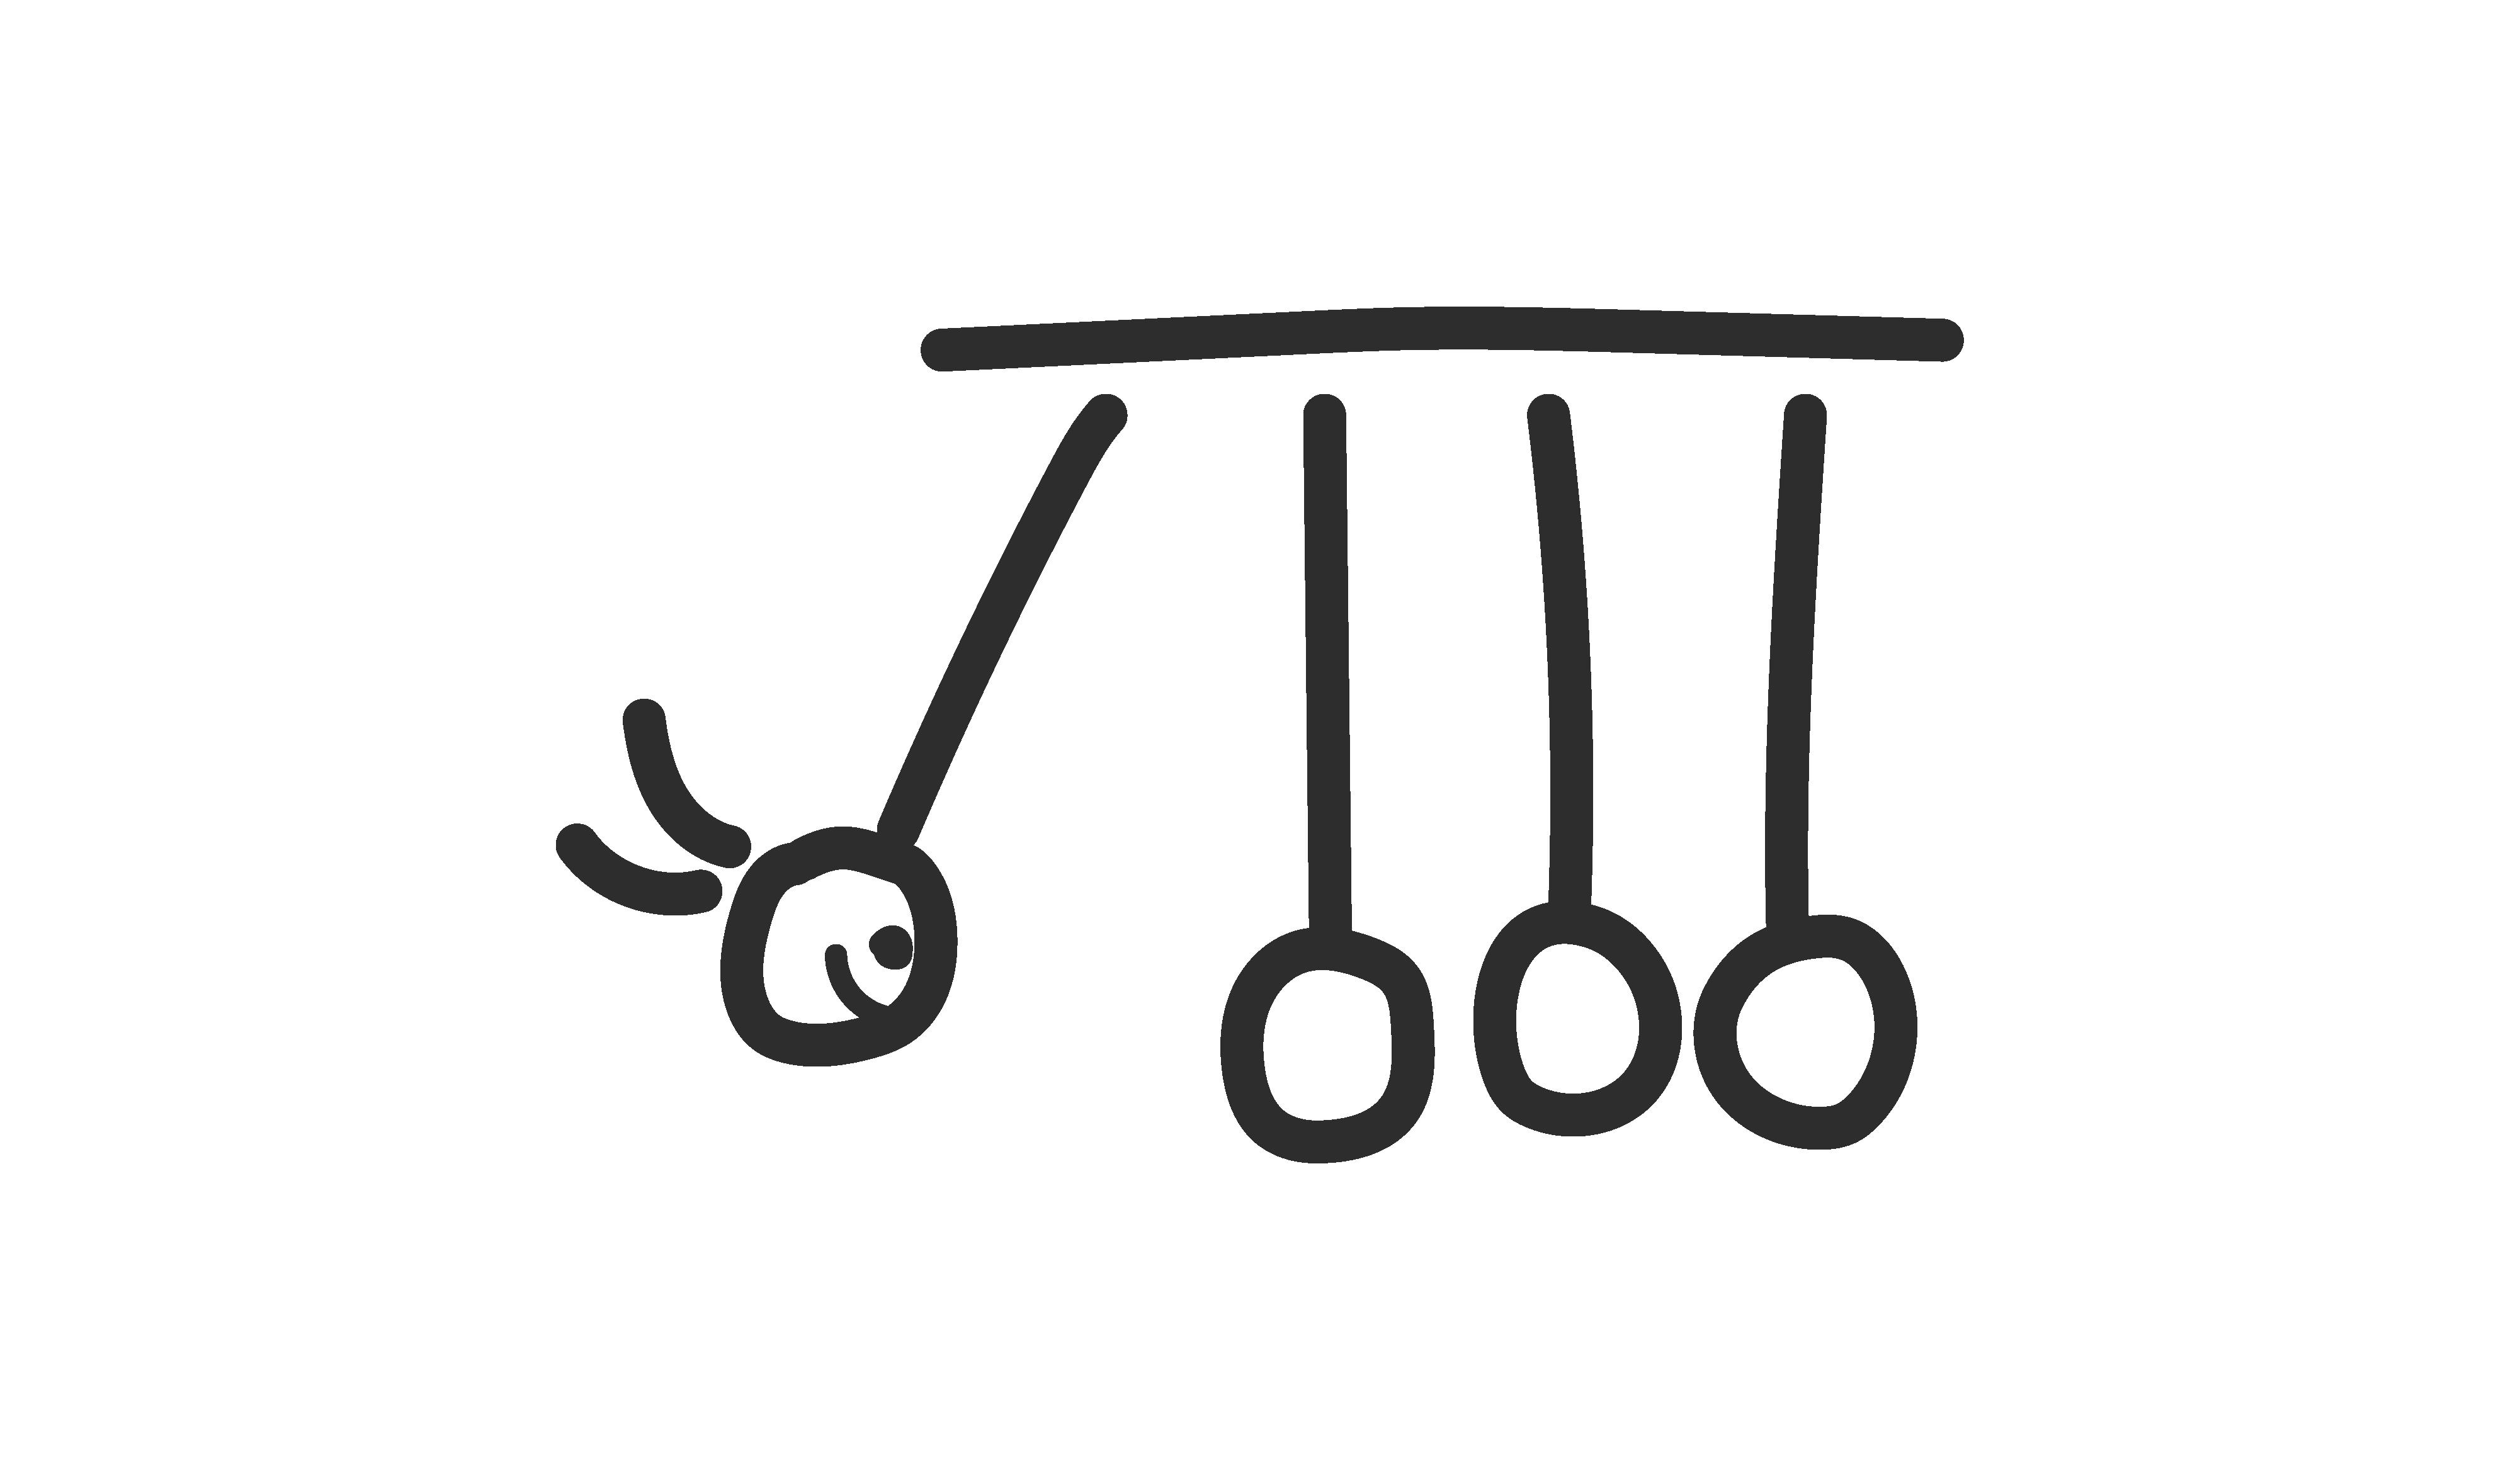 digital signage productivity